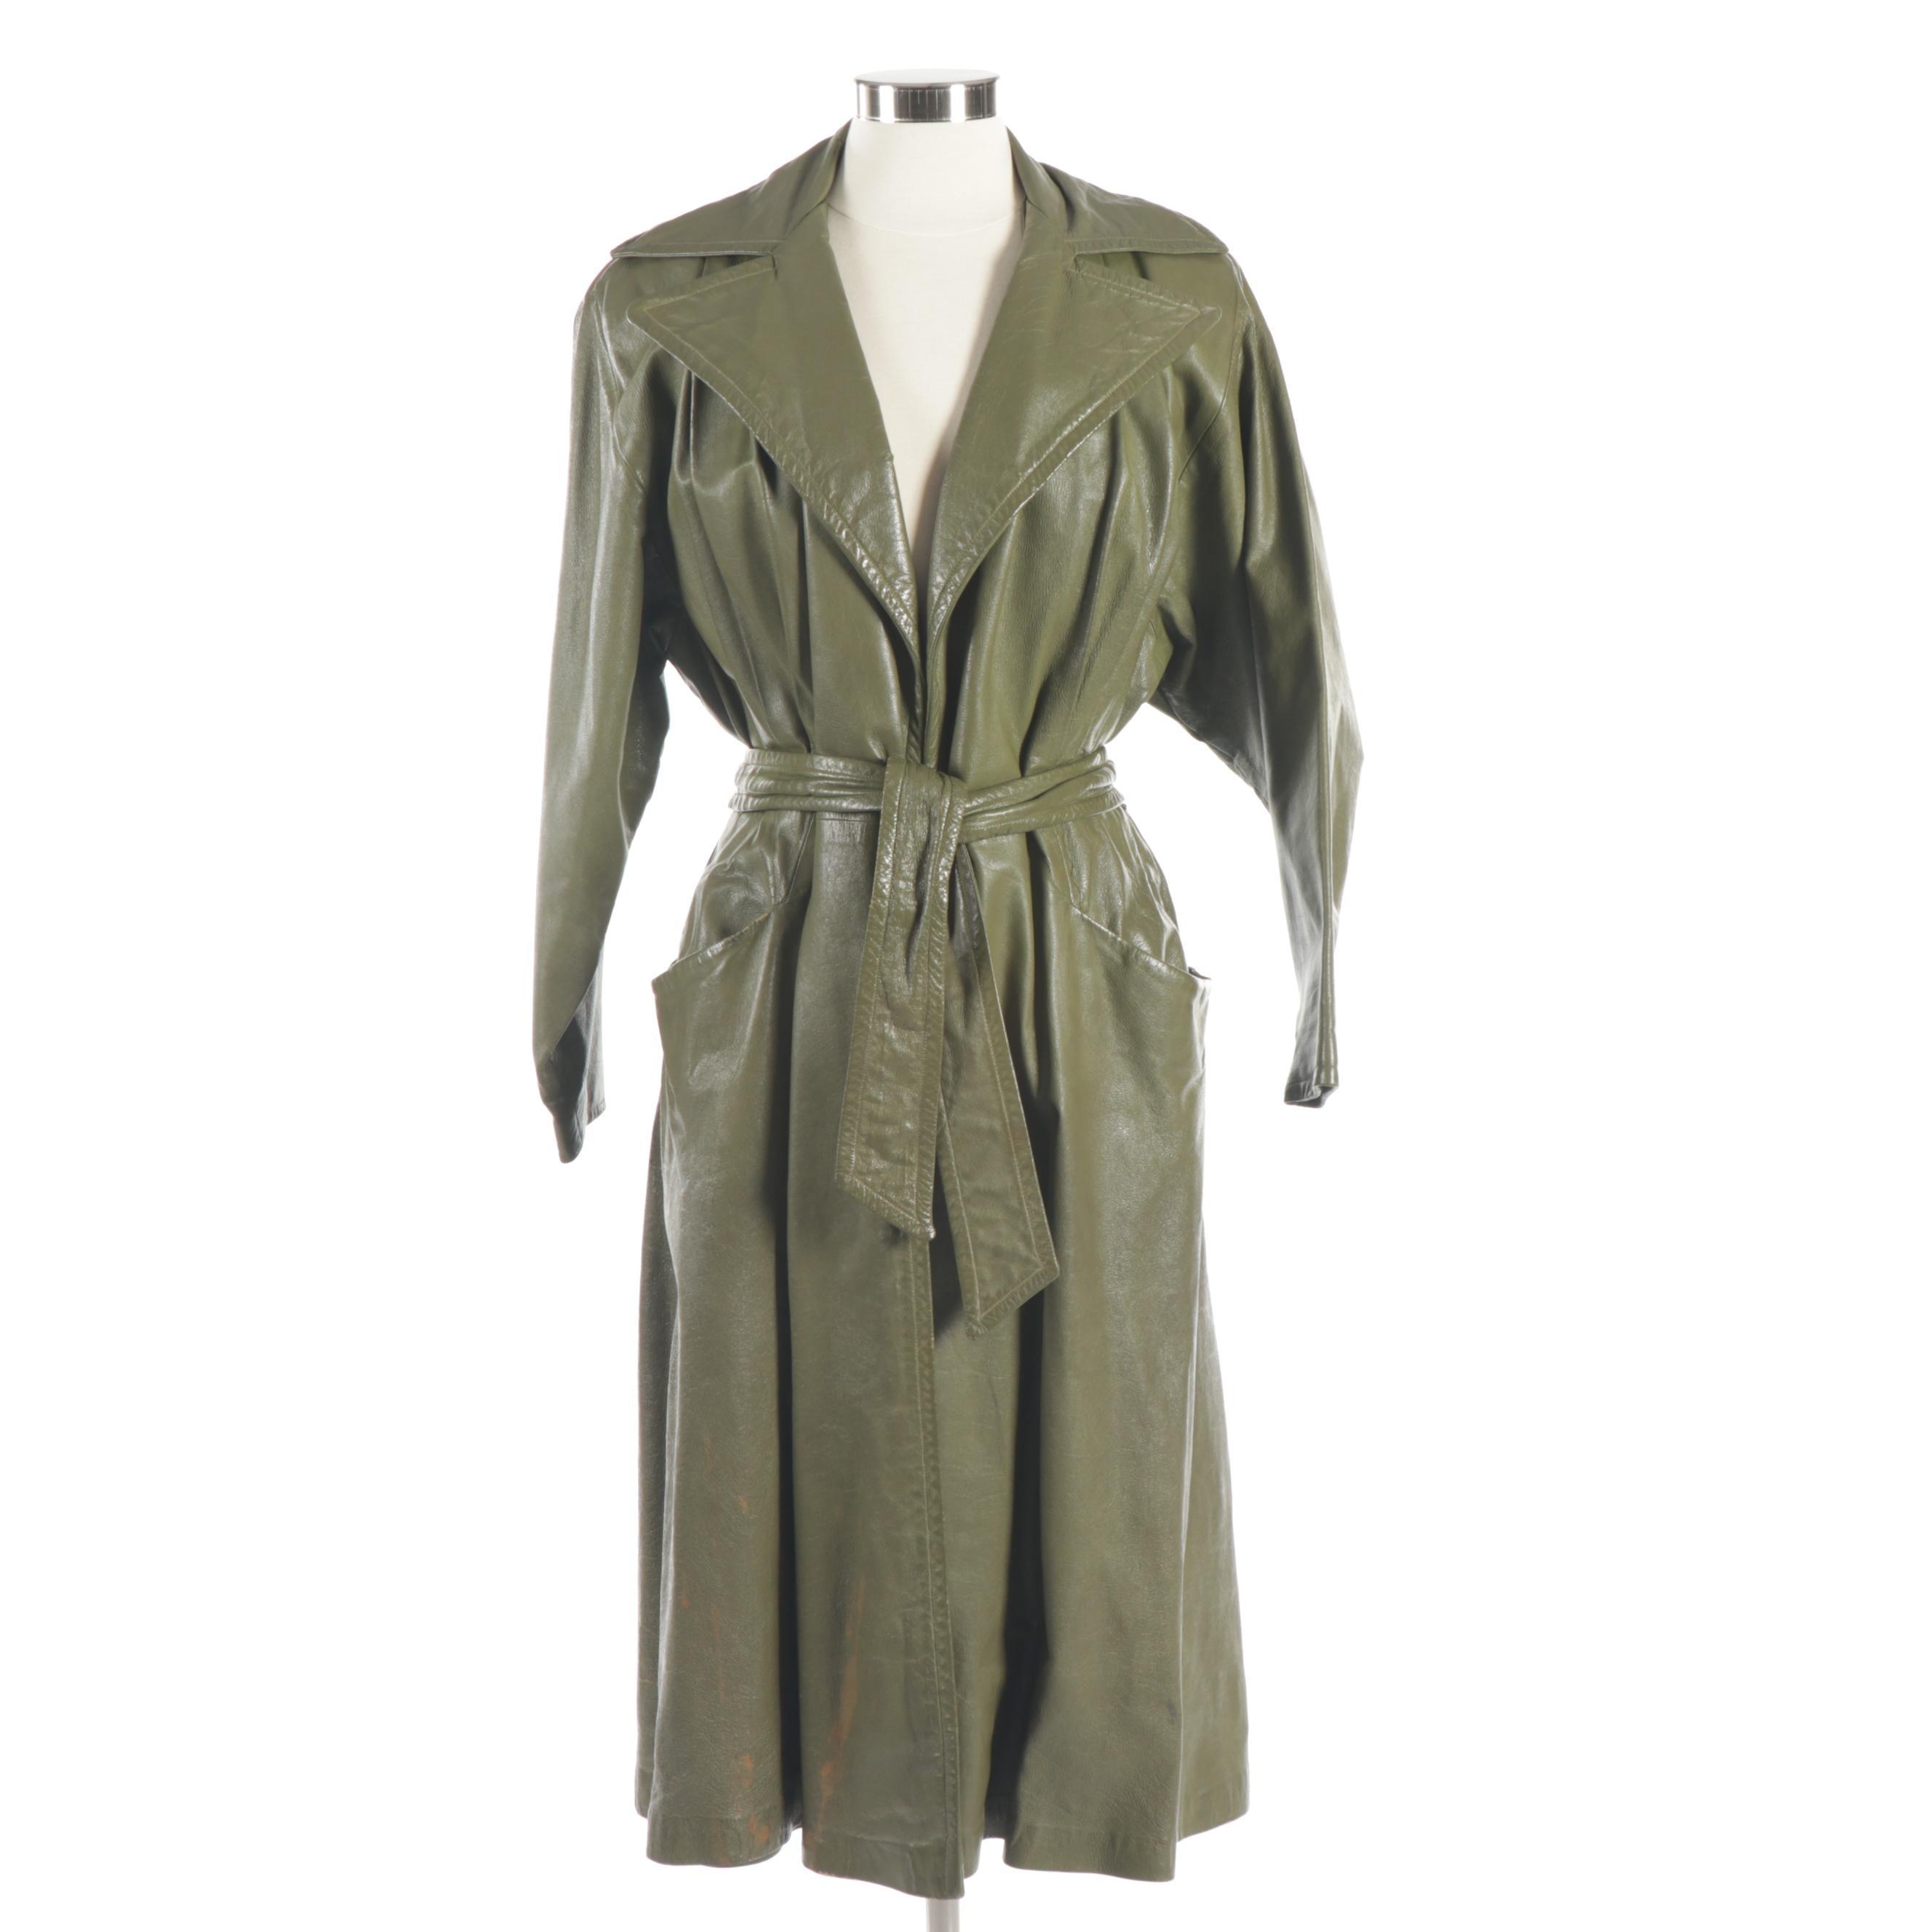 Samuel Robert Olive Green Leather Trench Coat, Vintage